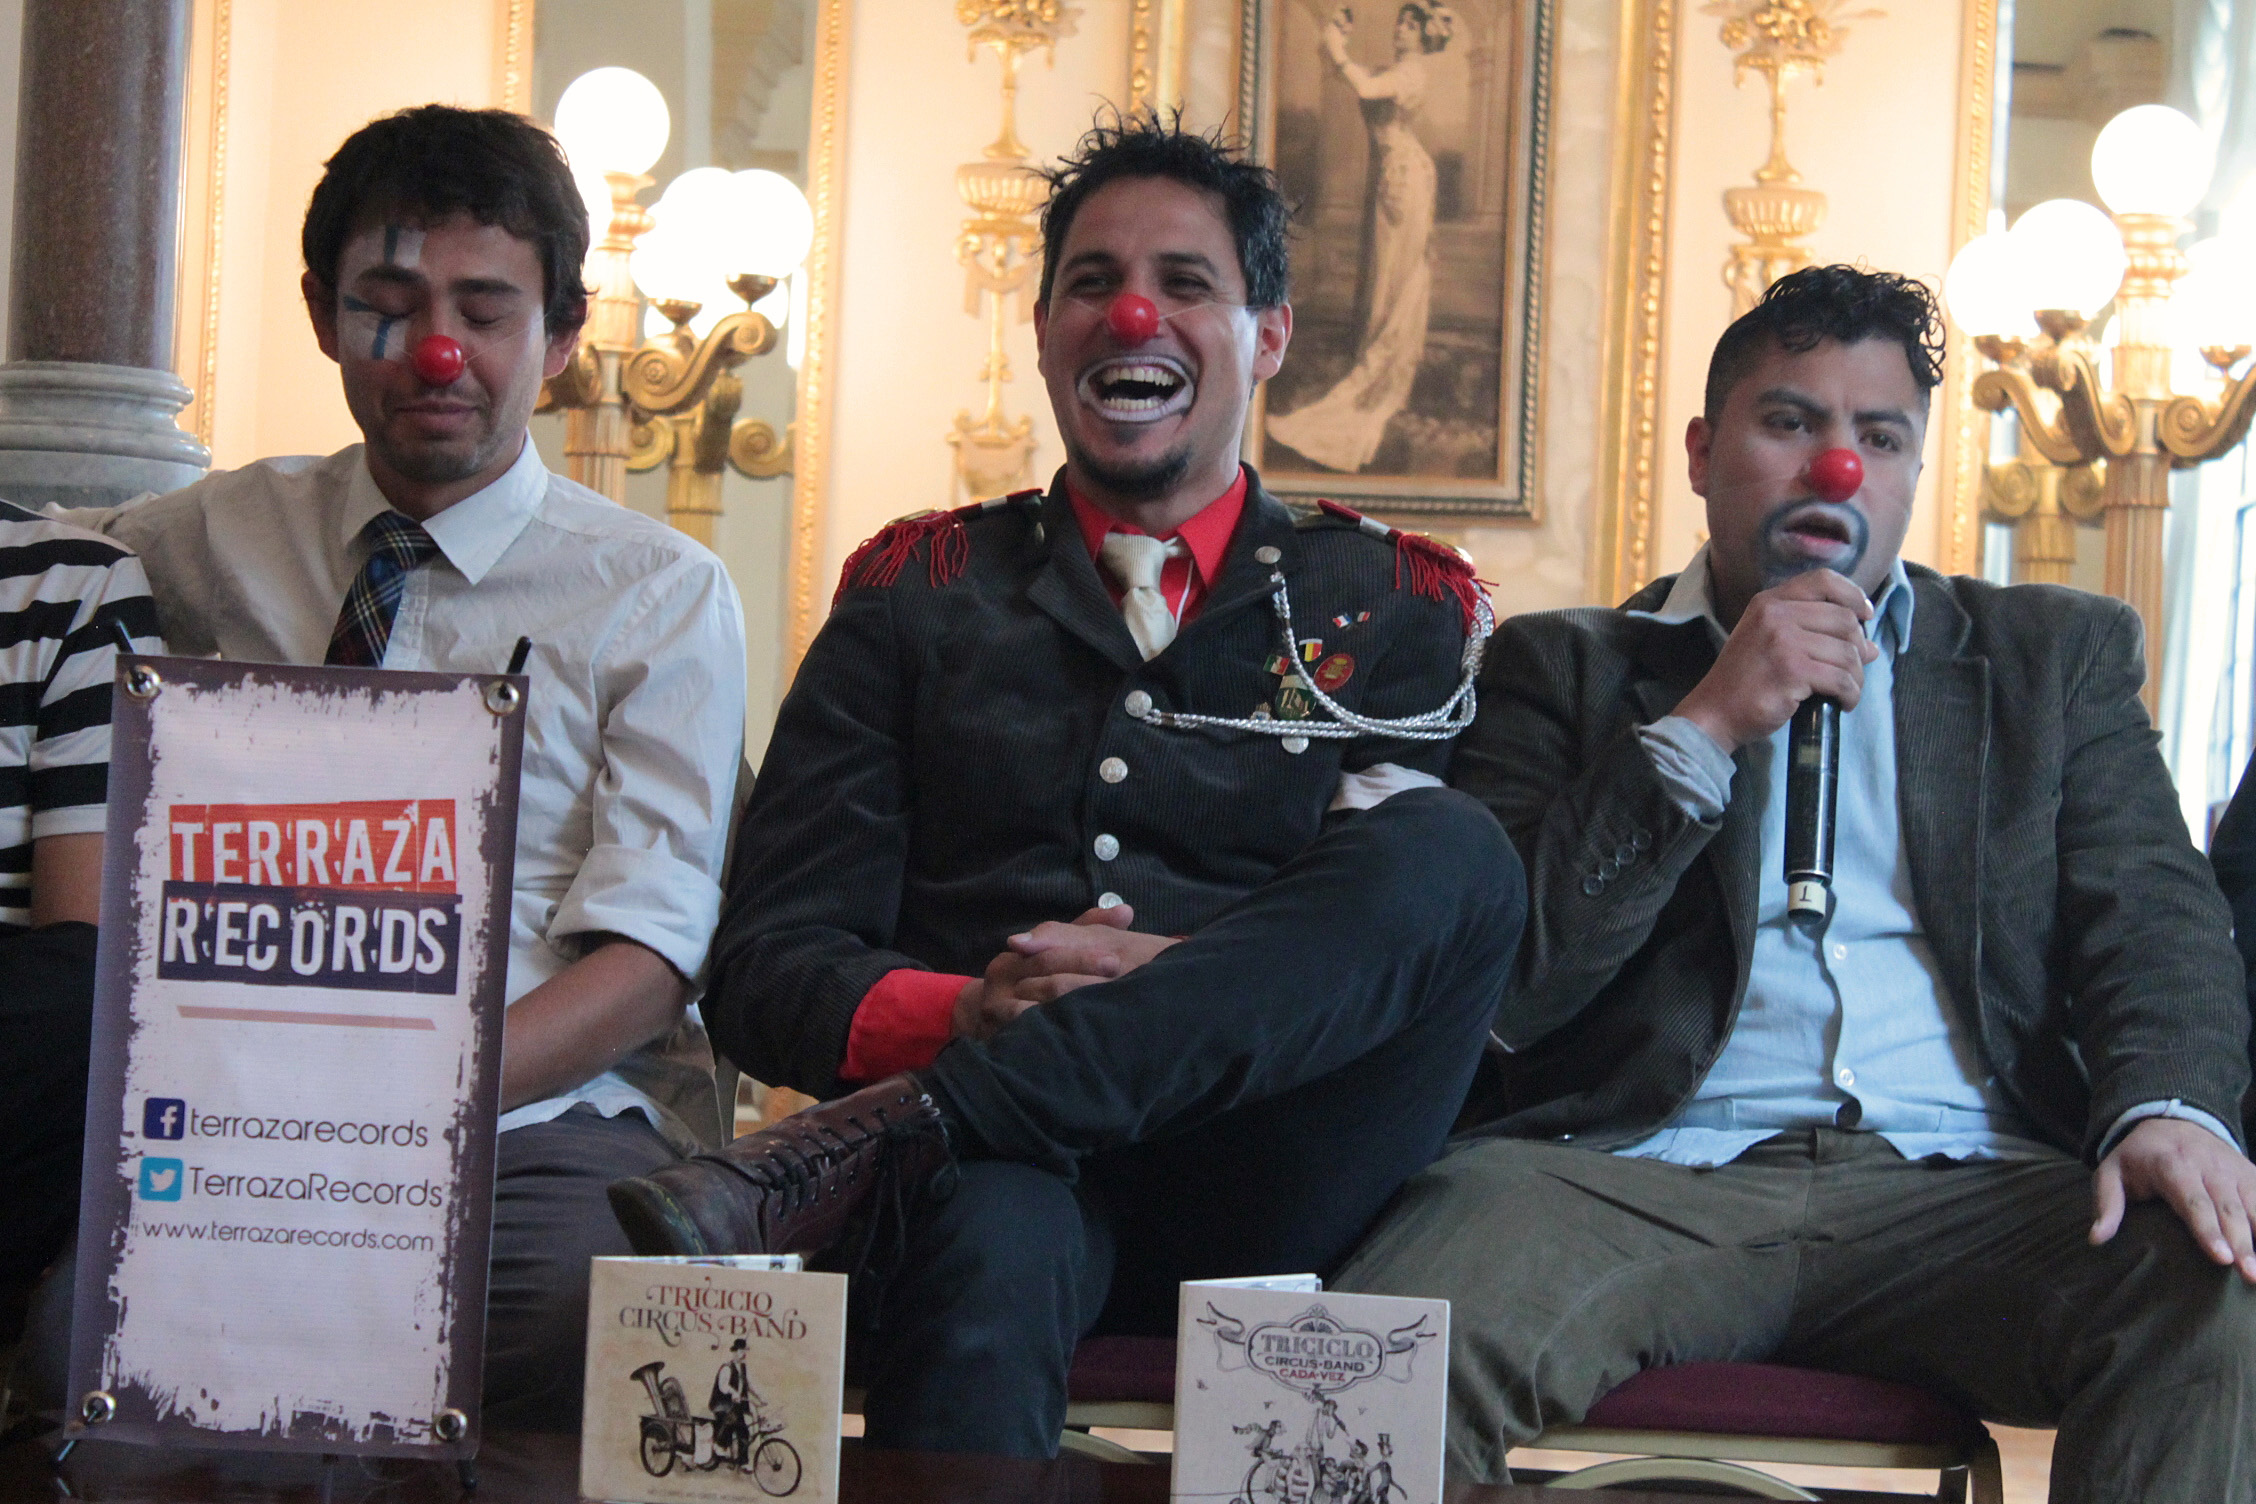 Triciclo Circus Band (4)